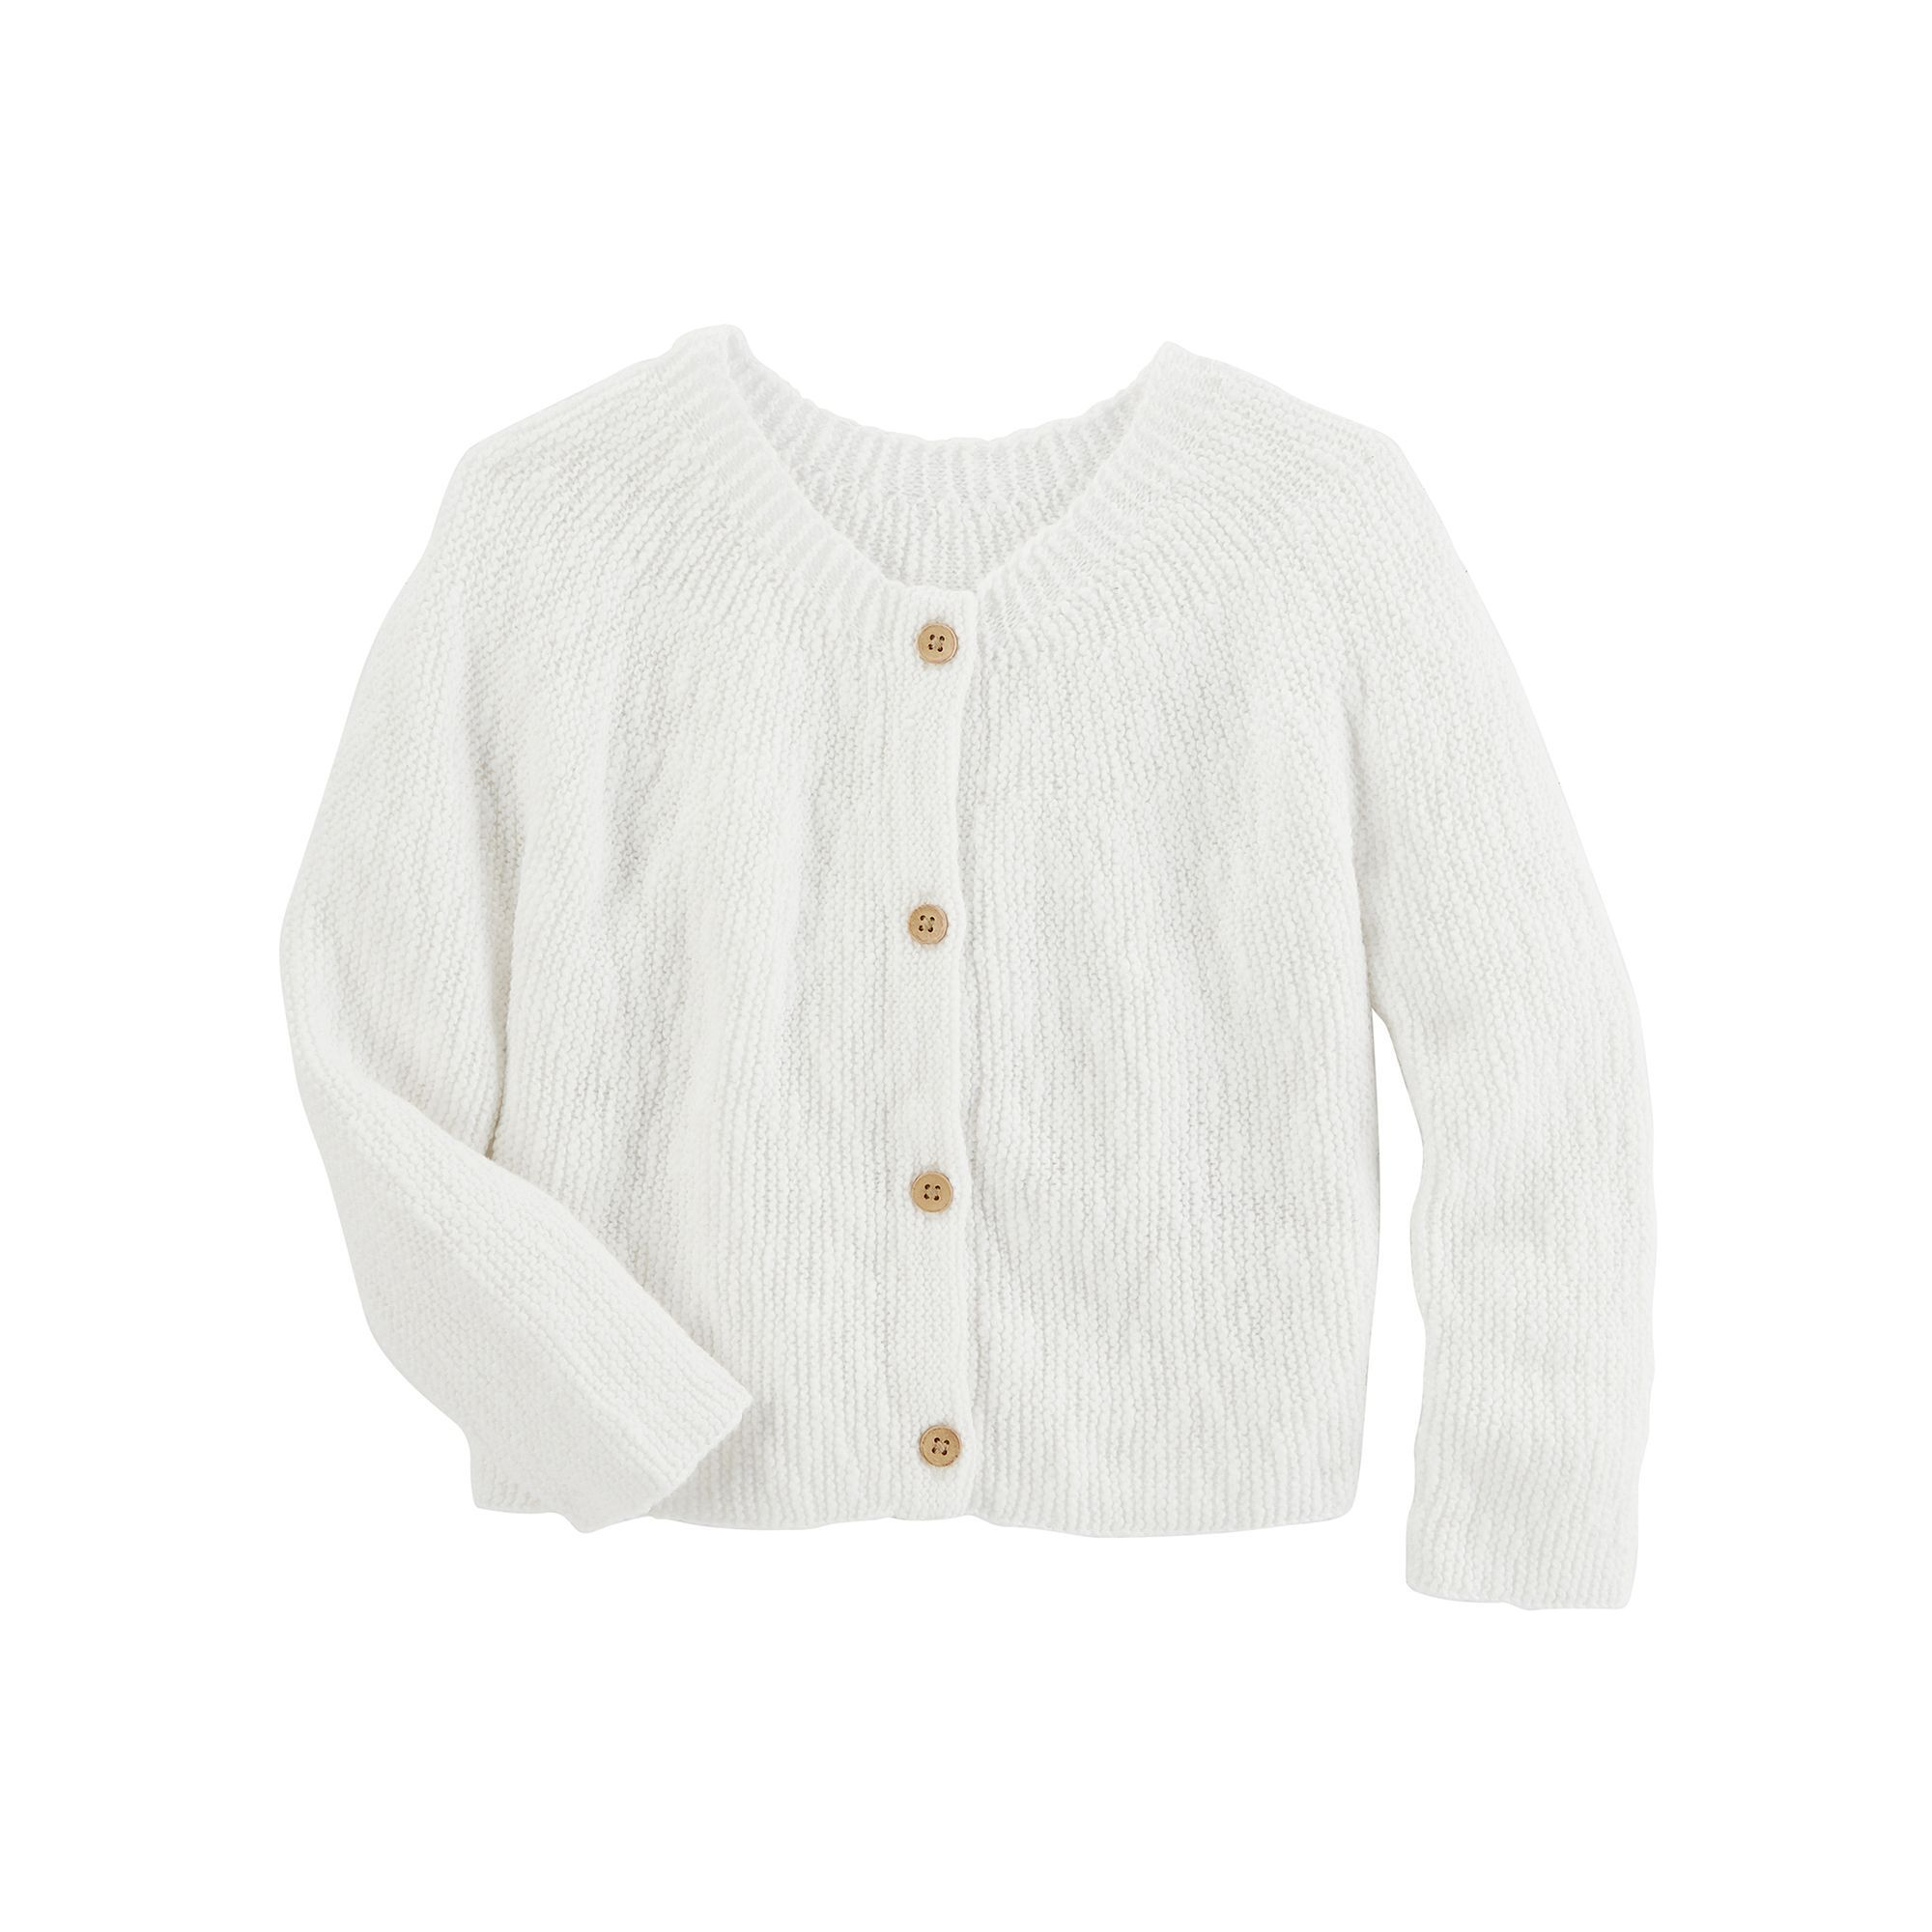 Toddler Girl OshKosh B'gosh® Sweater Knit Cardigan, Size: 3T, White